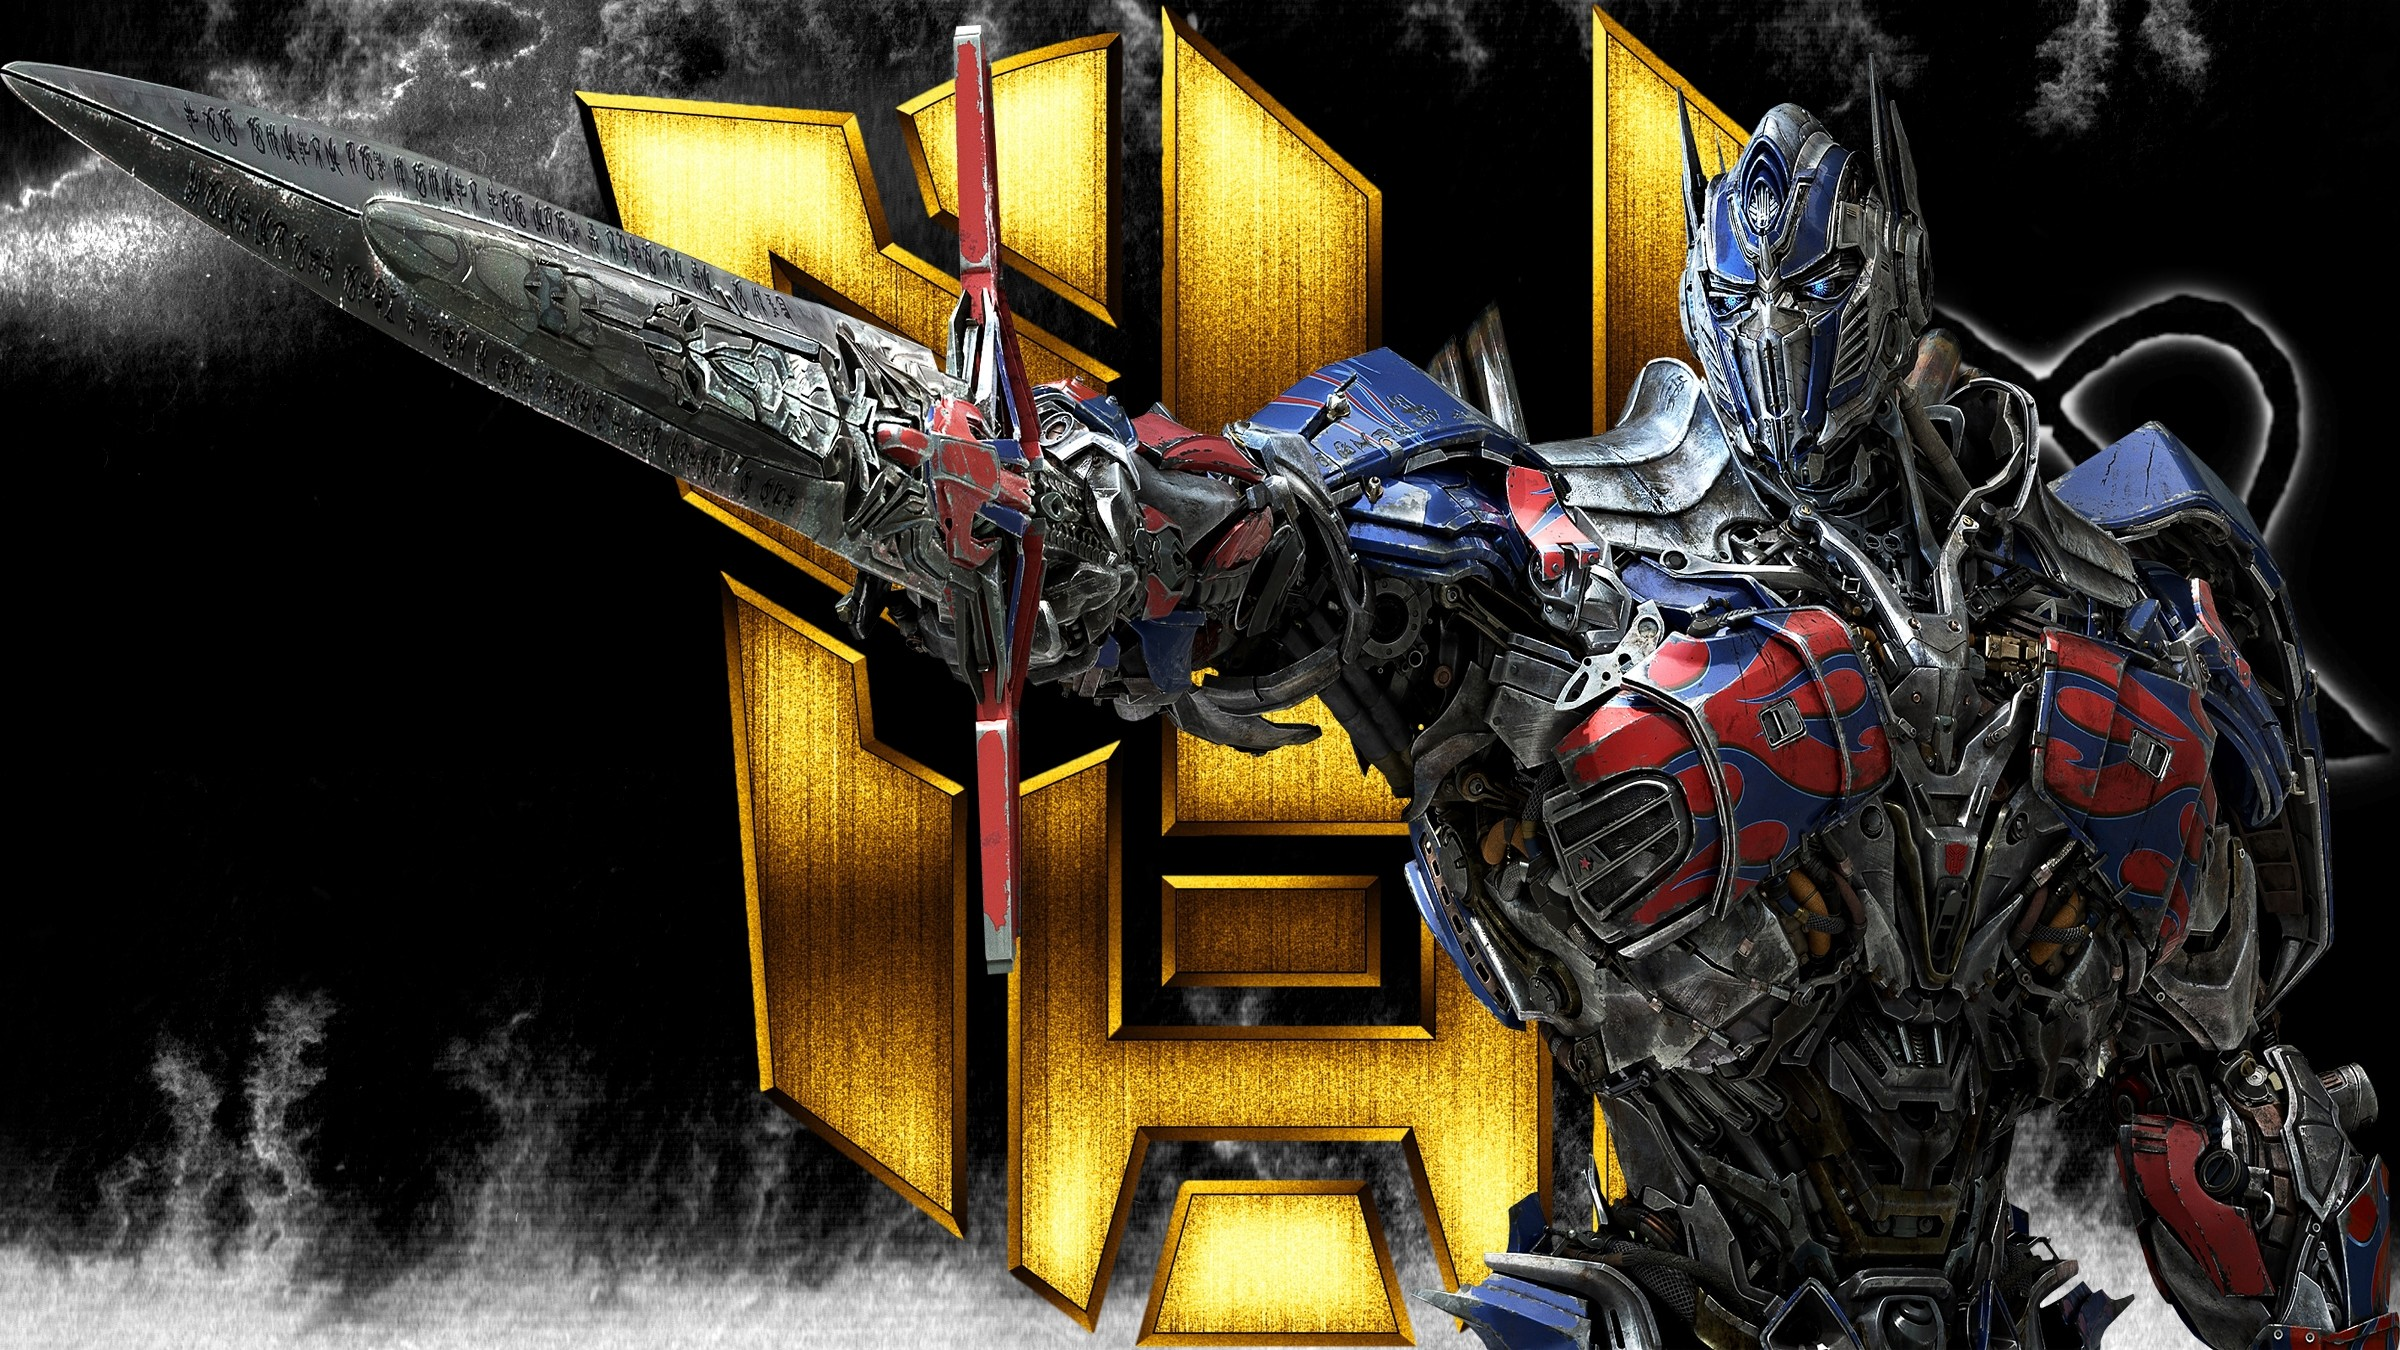 age of extinction 4 optimus prime wallpaper